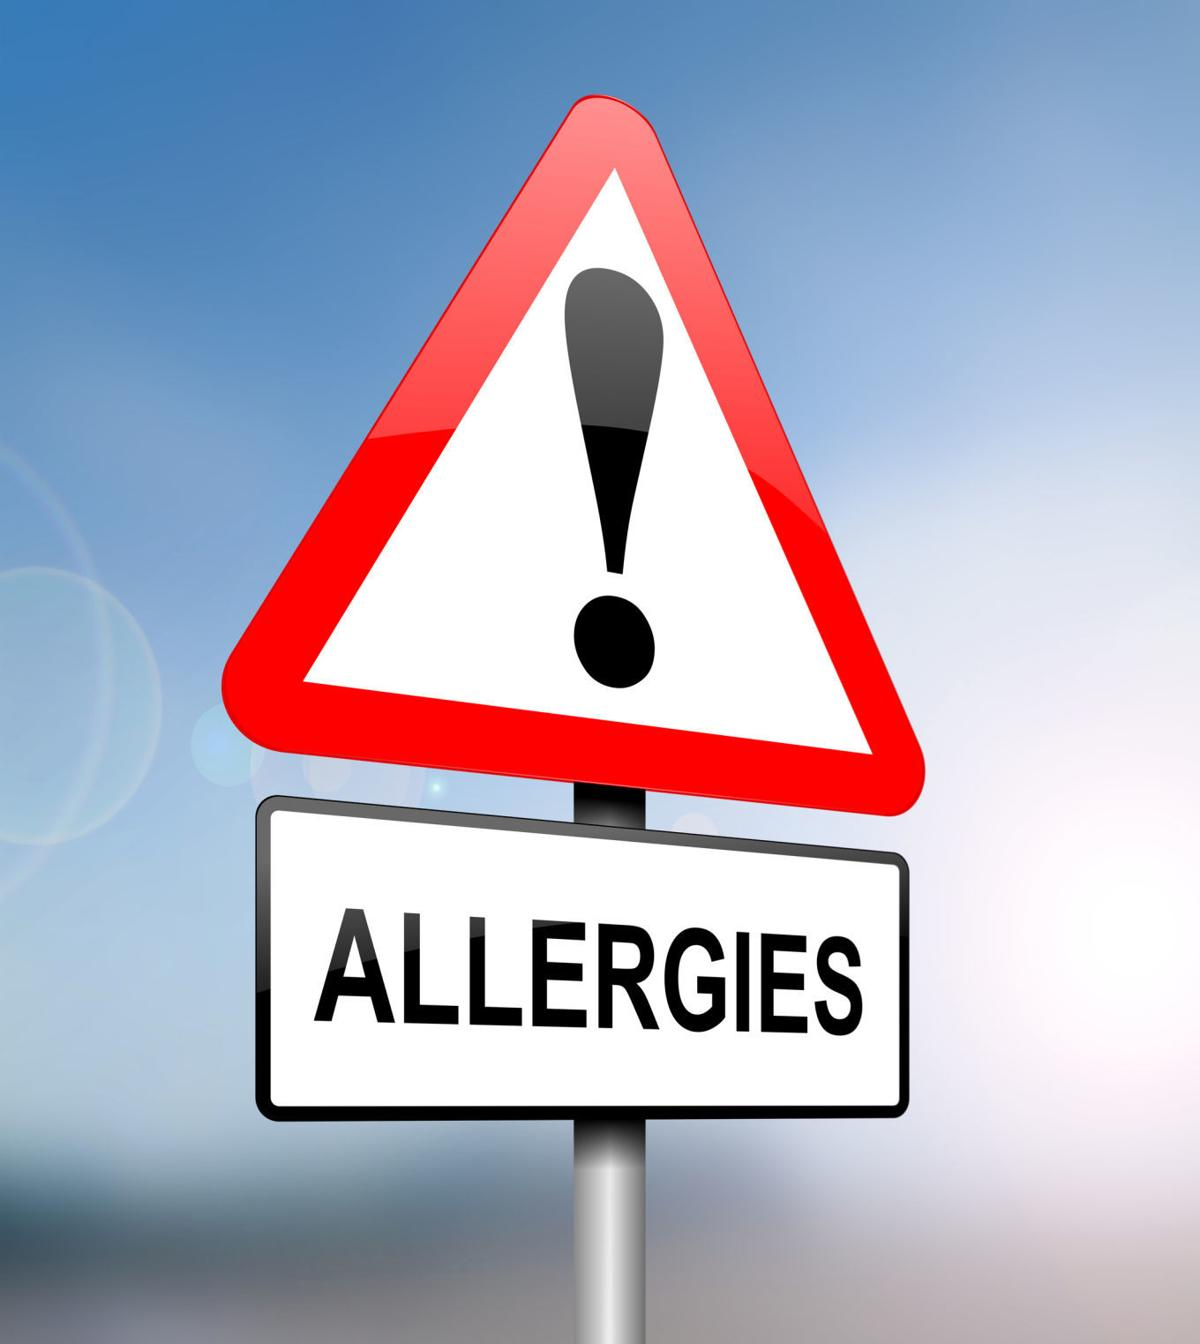 Allergies warning.